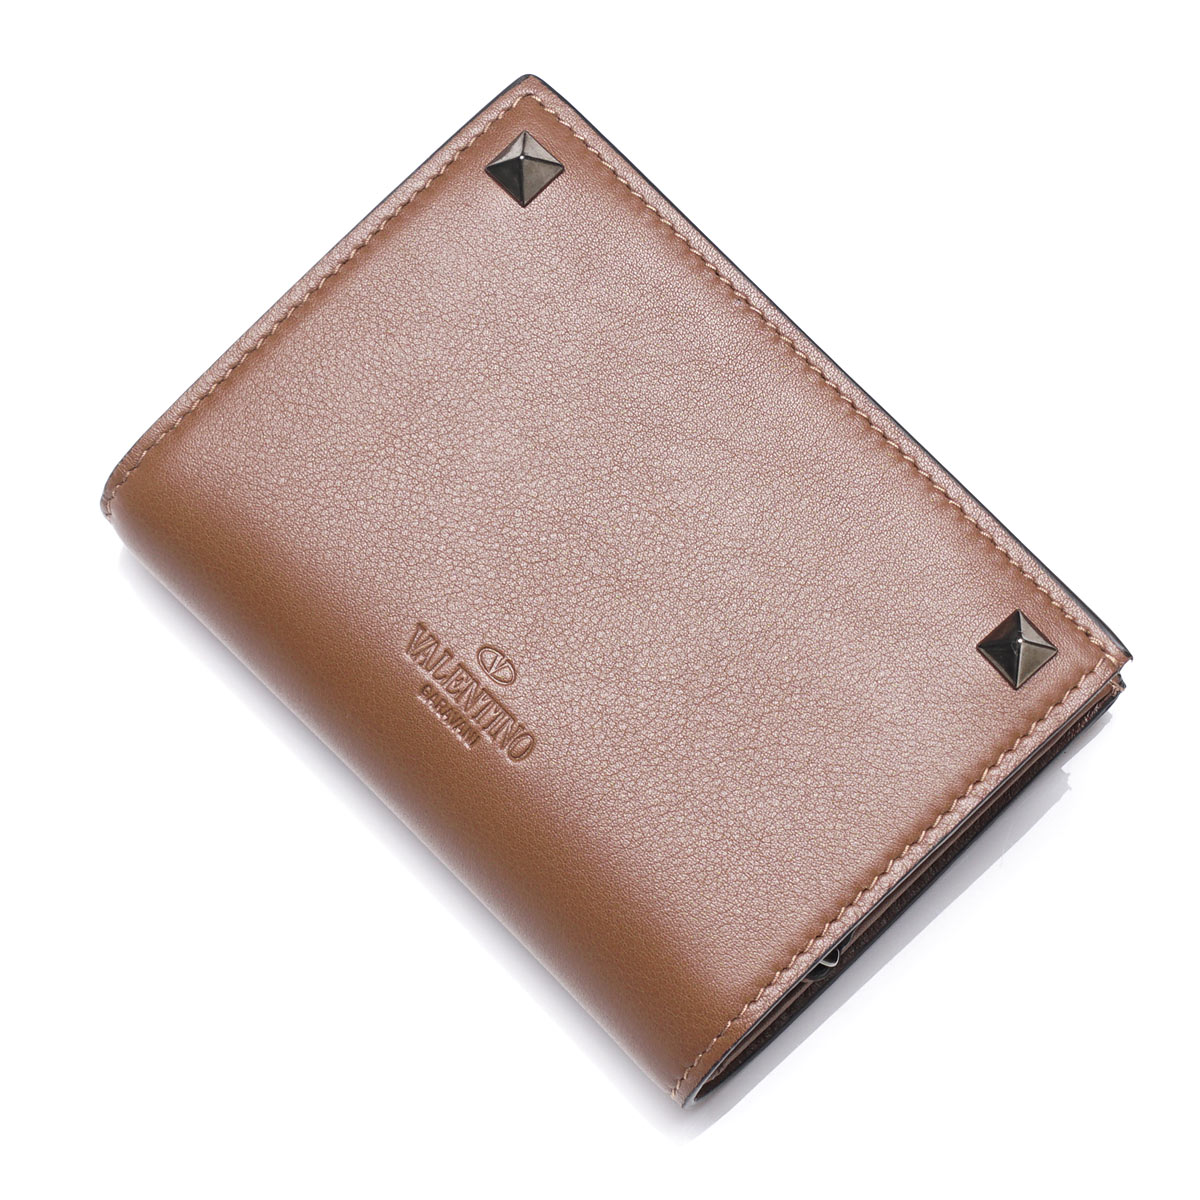 бумажник Valentino iy0p0536vh3/y11 2015